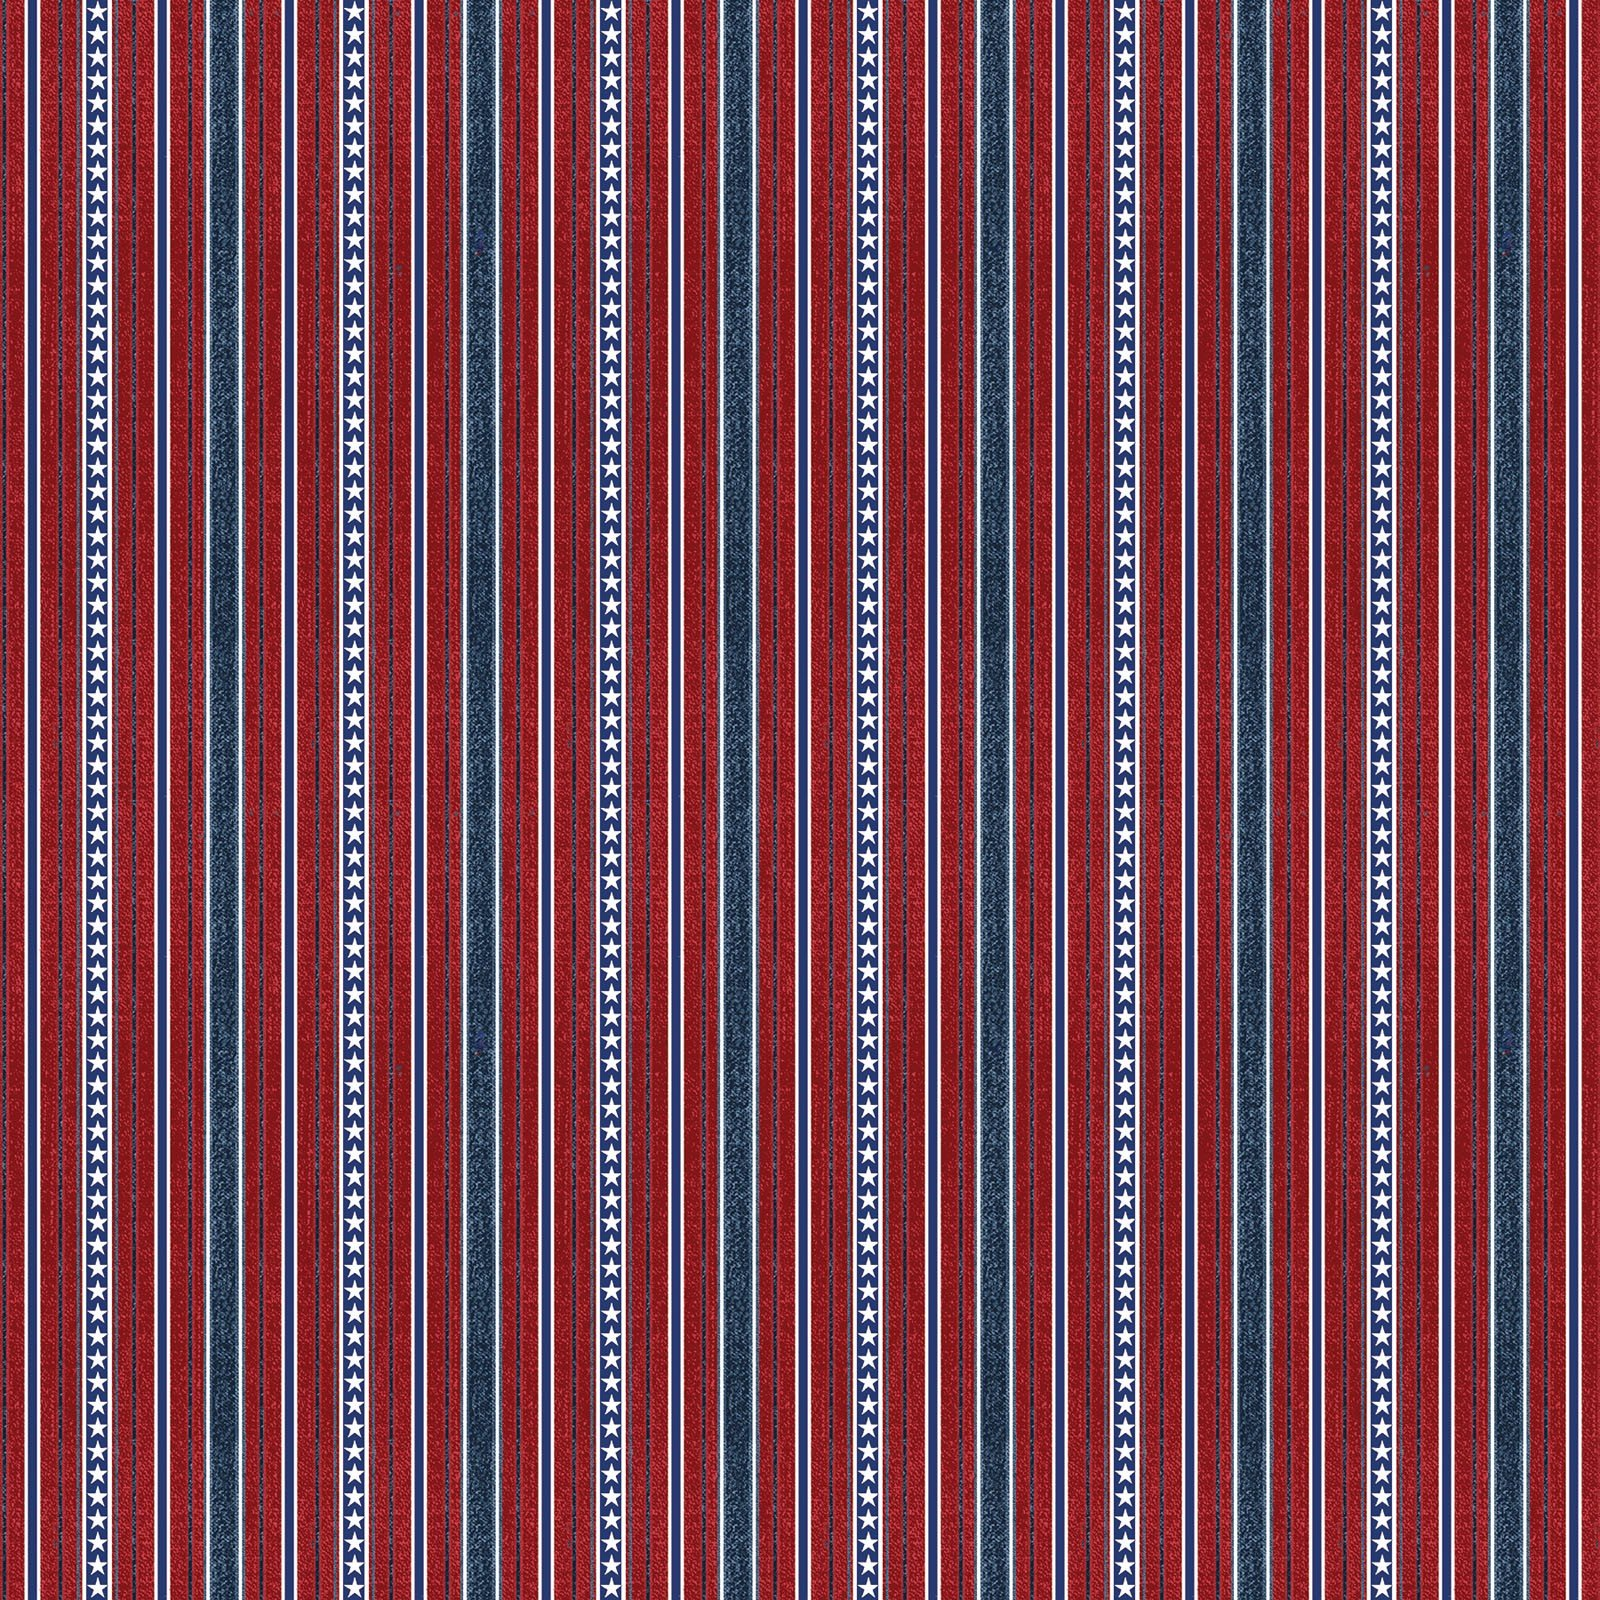 Red Stripe - American Rustic - BEN6335-10